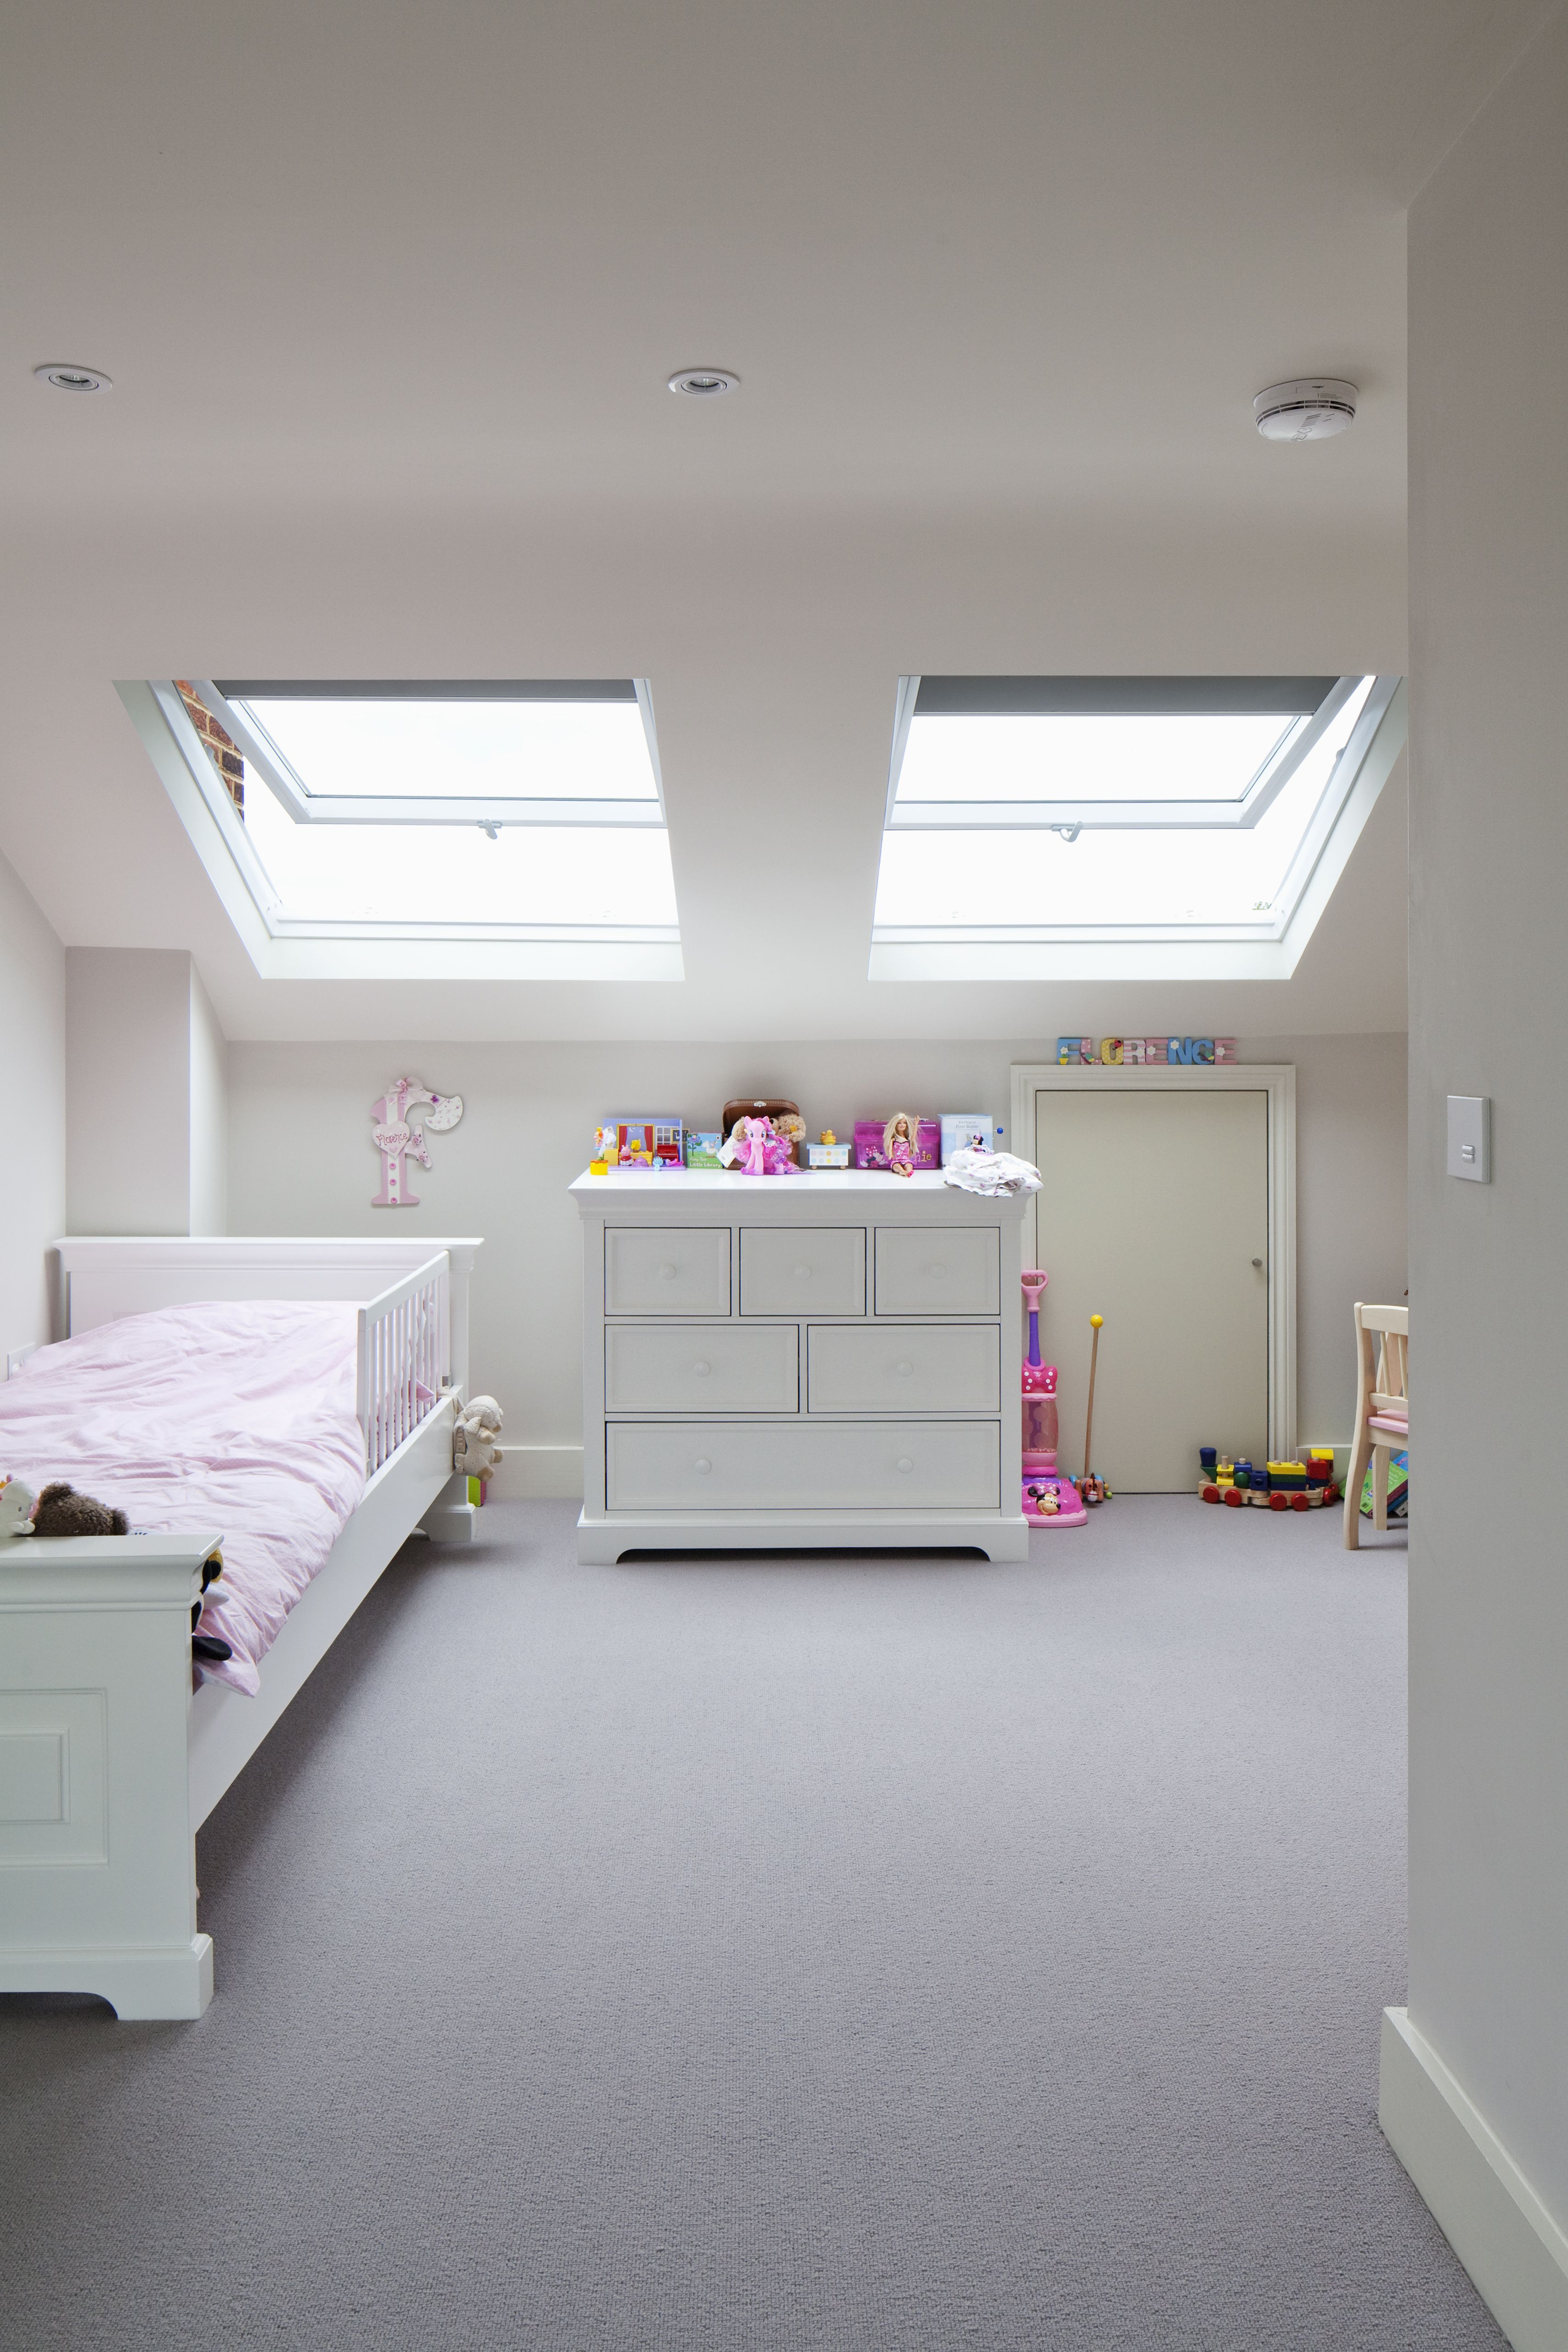 Loft bedroom Extension Hidden eaves storage